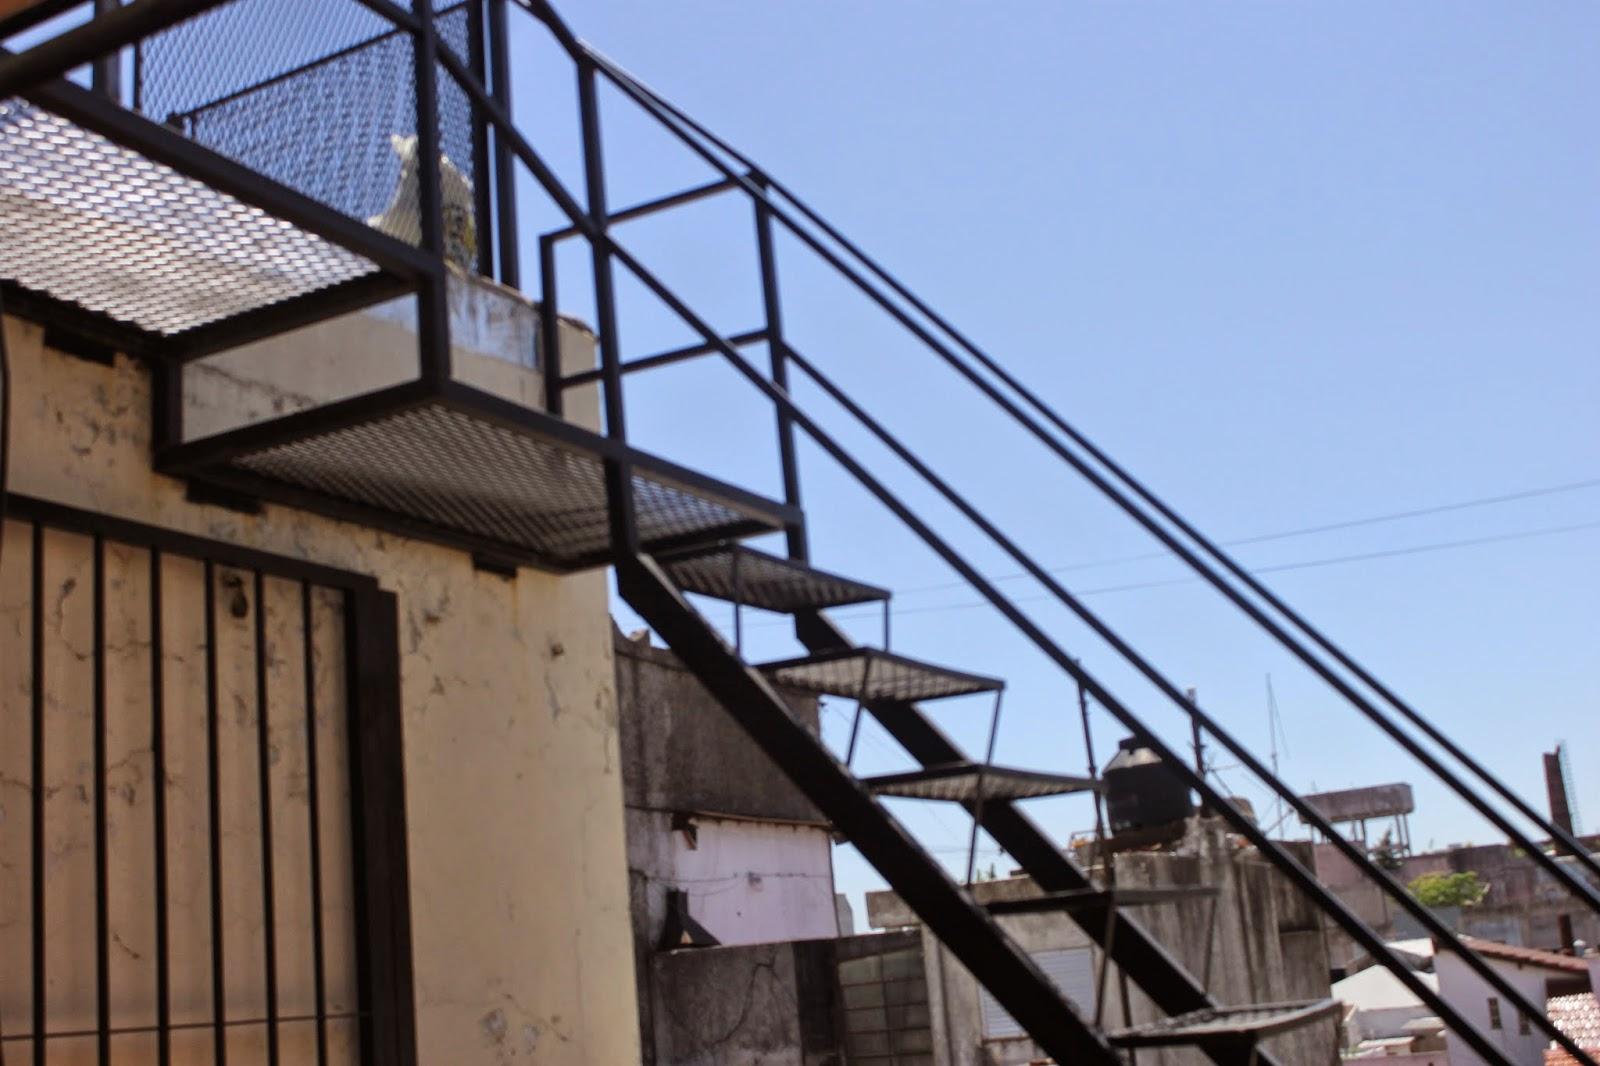 Herrer a hefesto capital federal buenos aires caba for Toldos para balcones capital federal